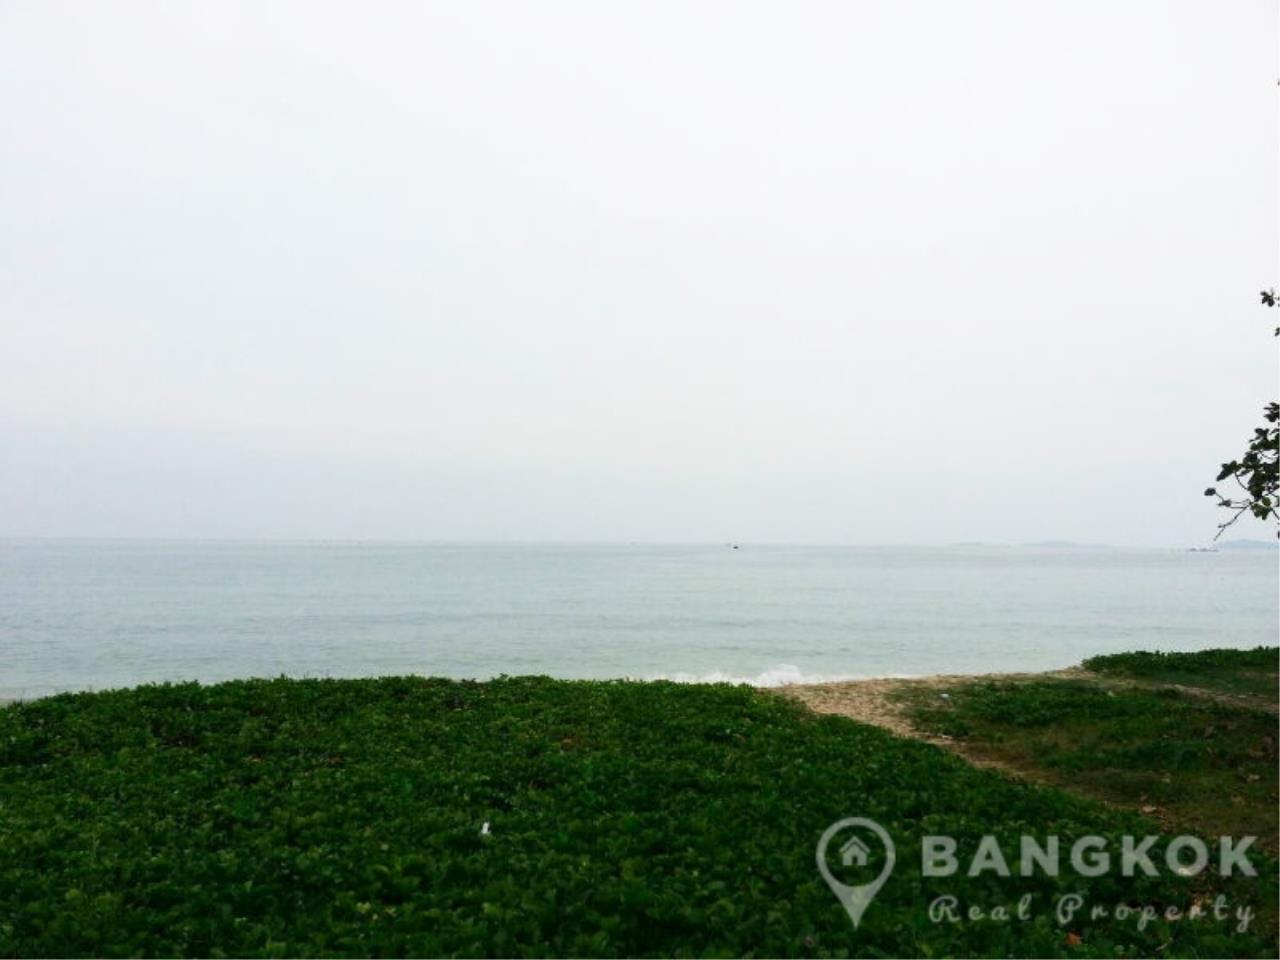 Land for Sale Rayong ขายที่ดินบ้านฉาง ระยอง 54 ไร่